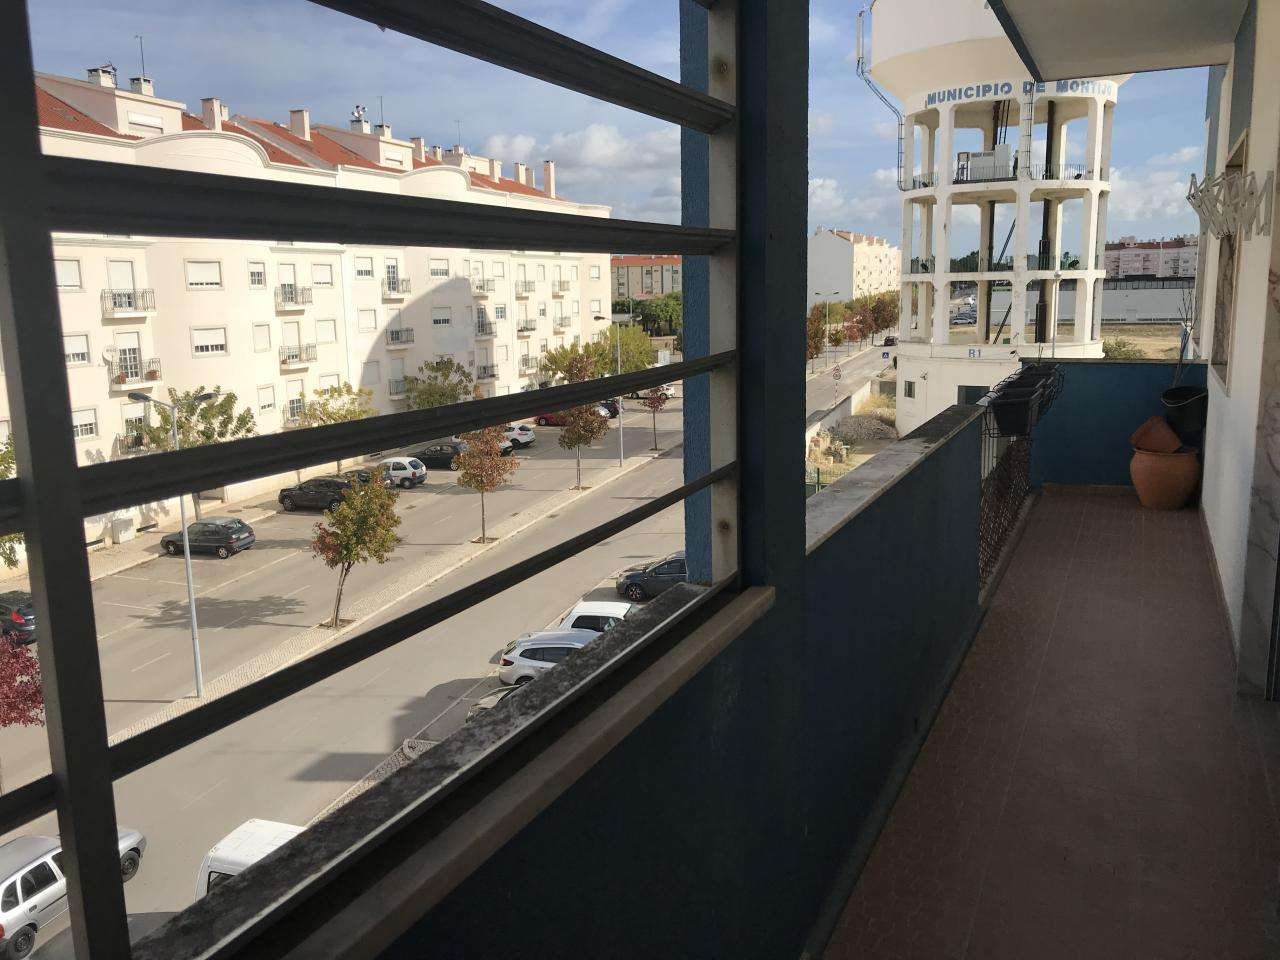 Apartamento para comprar, Montijo e Afonsoeiro, Montijo, Setúbal - Foto 24